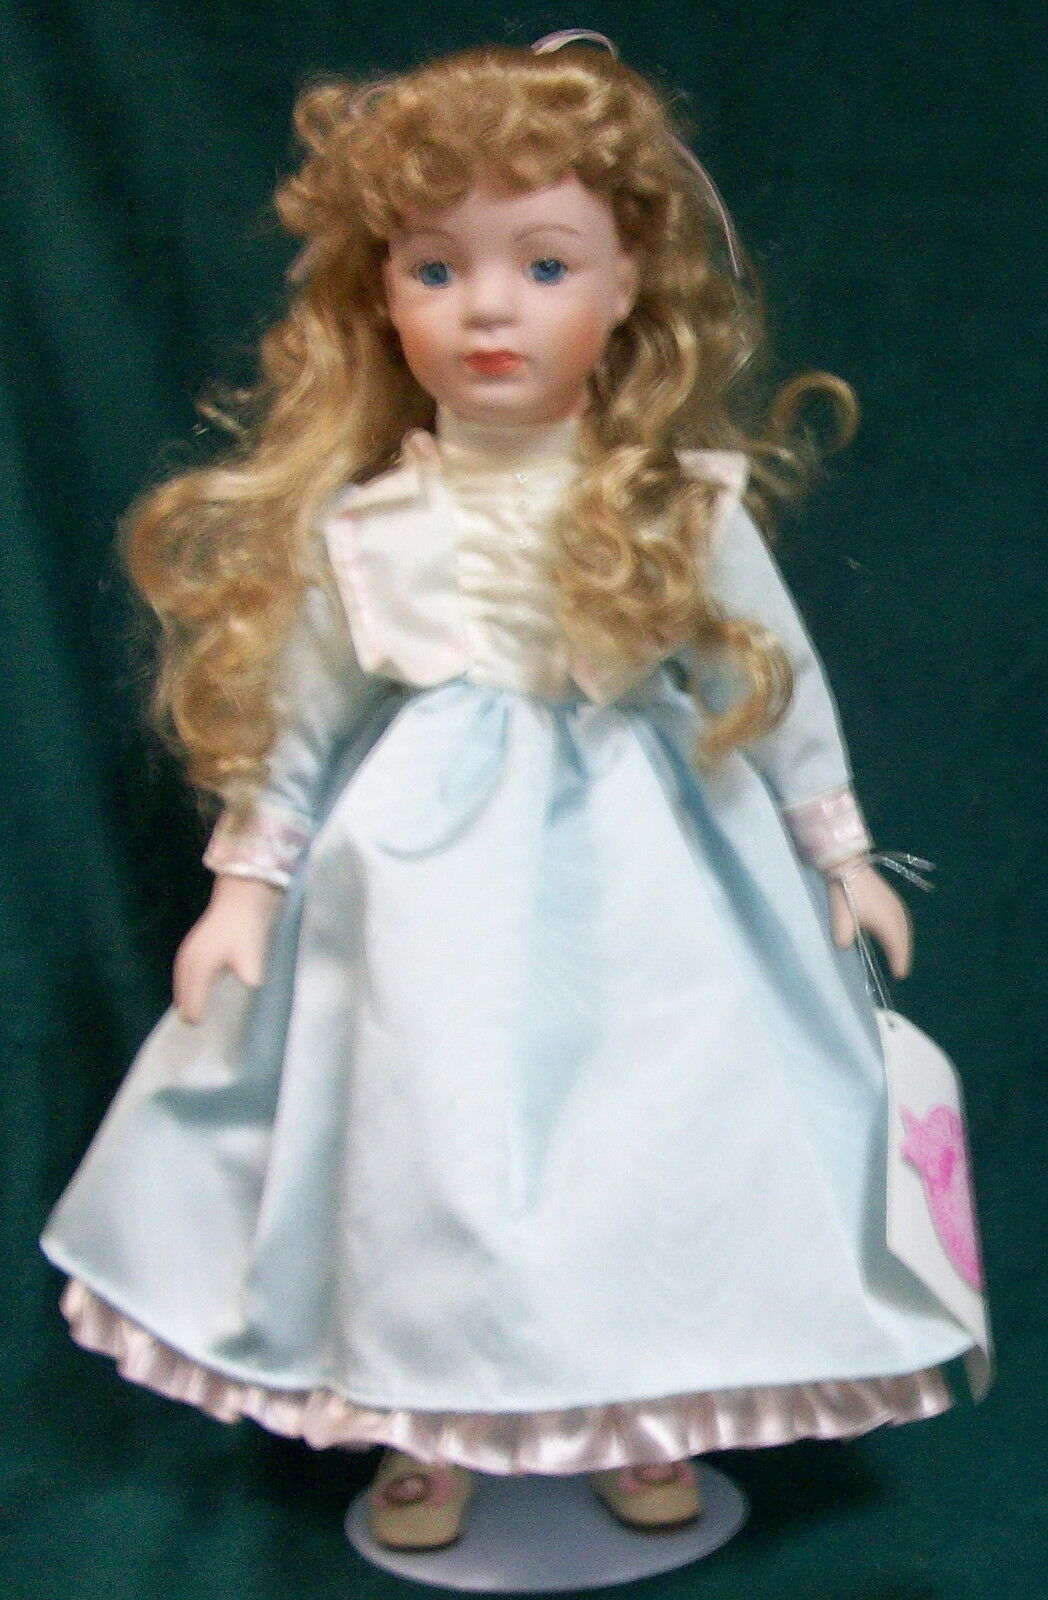 prezzo basso MELODY lungo Wavy Blonde Hair & & & blu Eyes bambola by TUSSINI COLLECTION - NIB  vendita di fama mondiale online